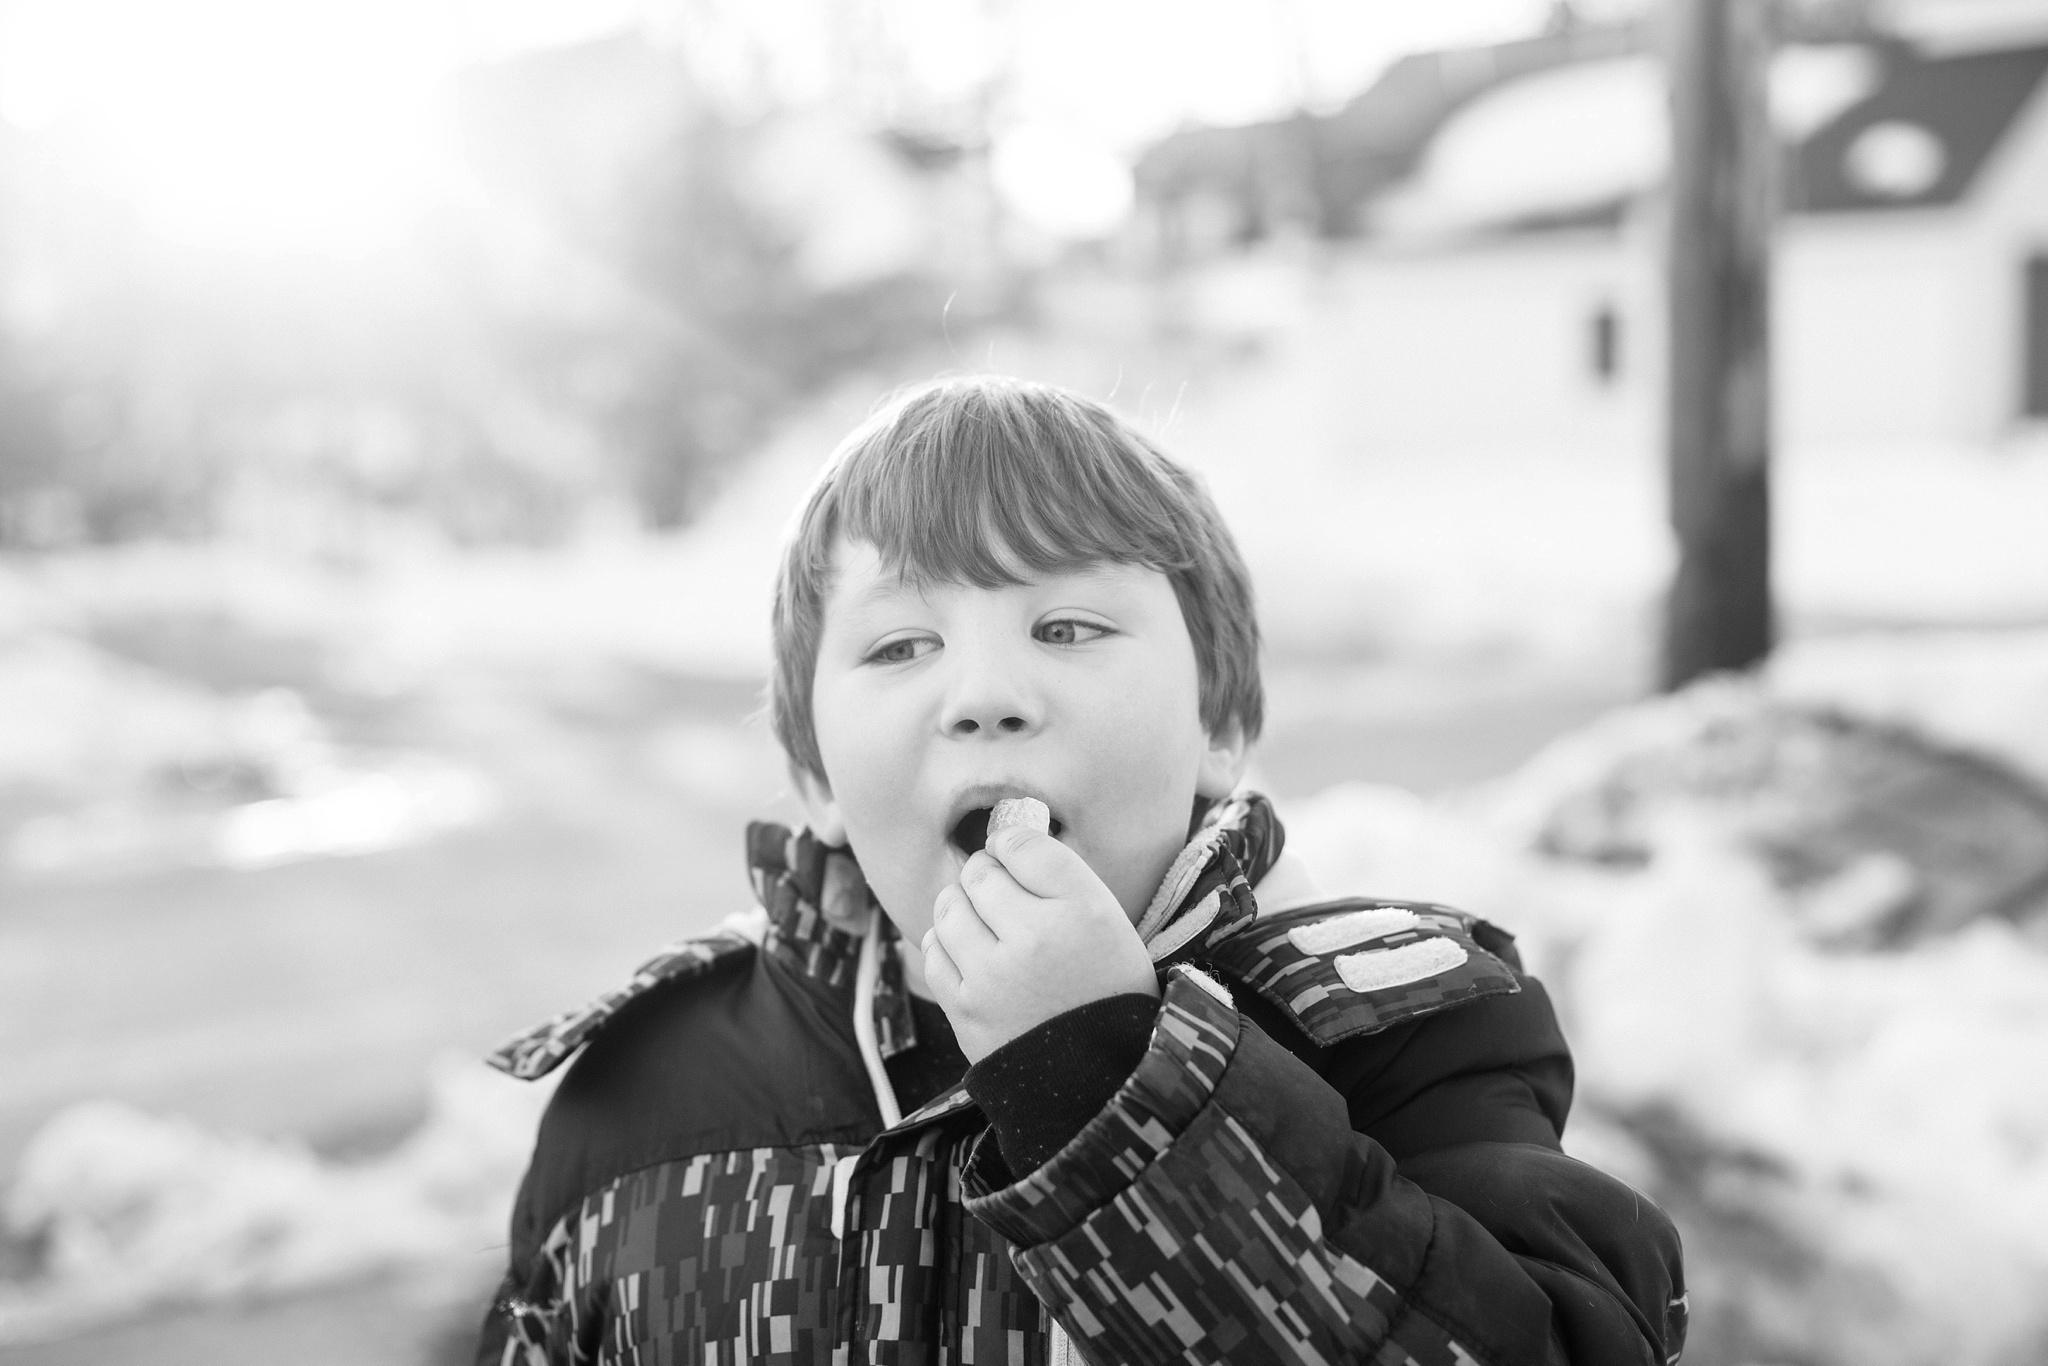 kid eating snow